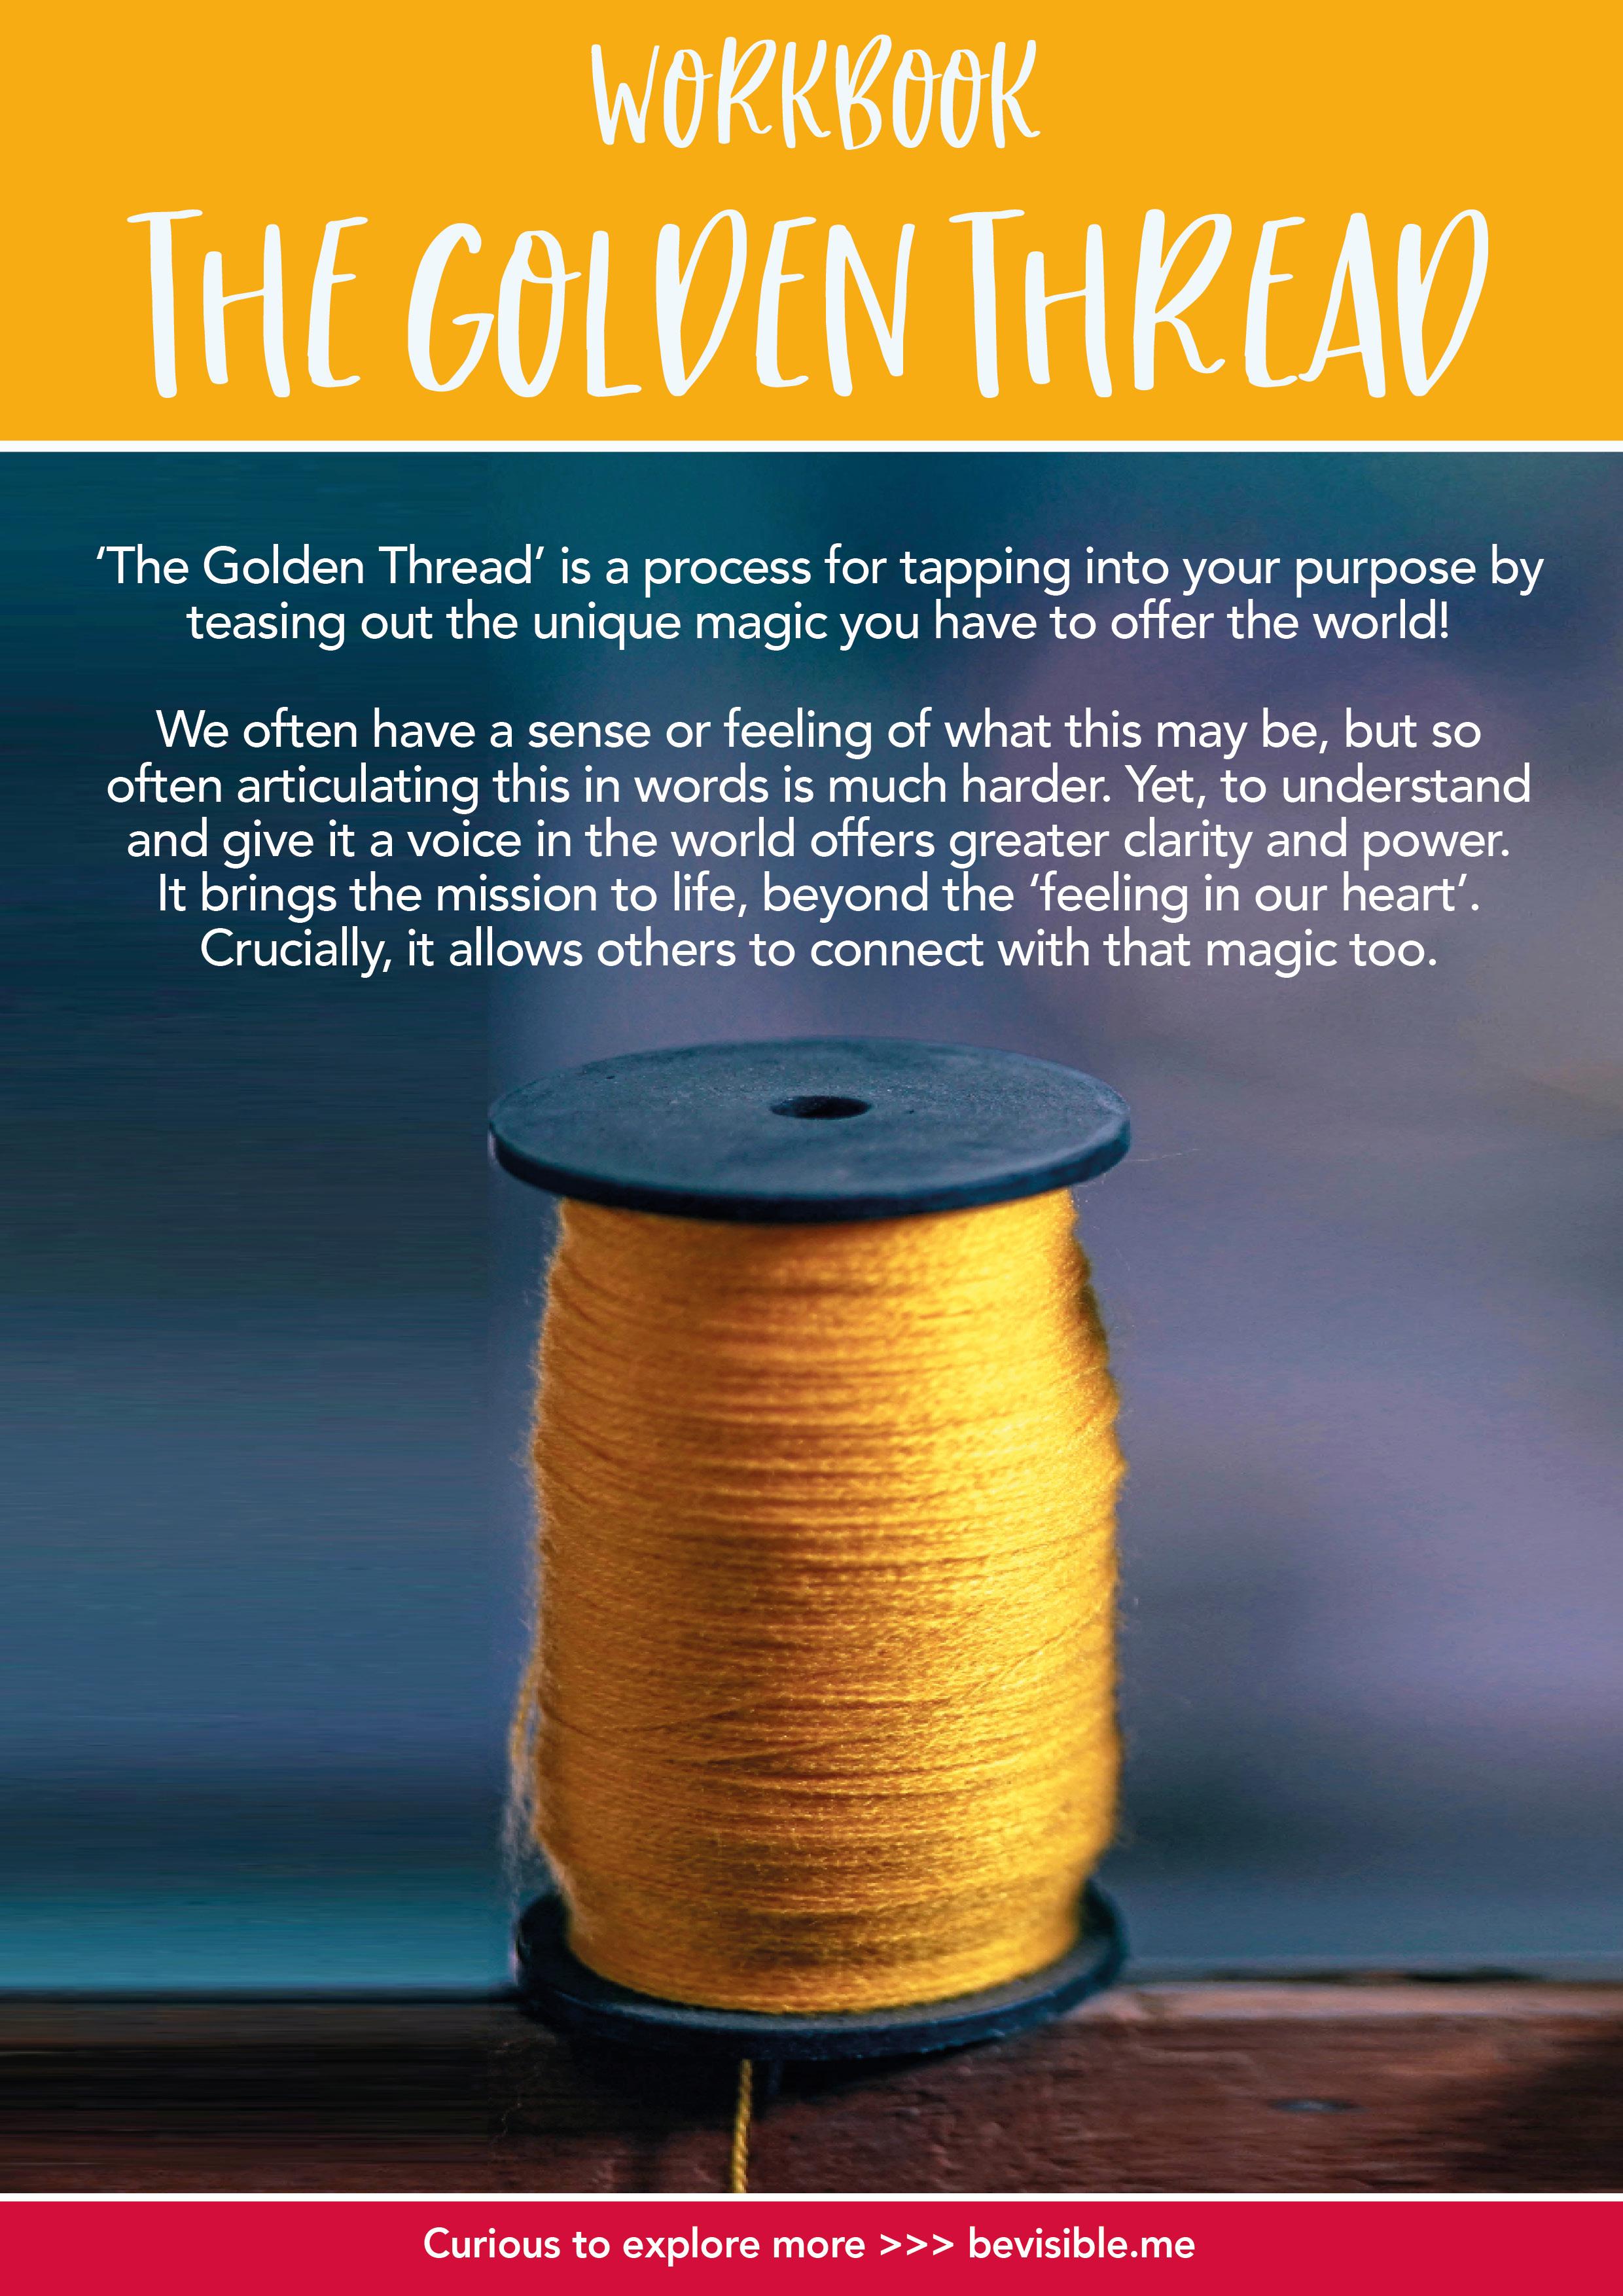 golden thread book cover.jpg